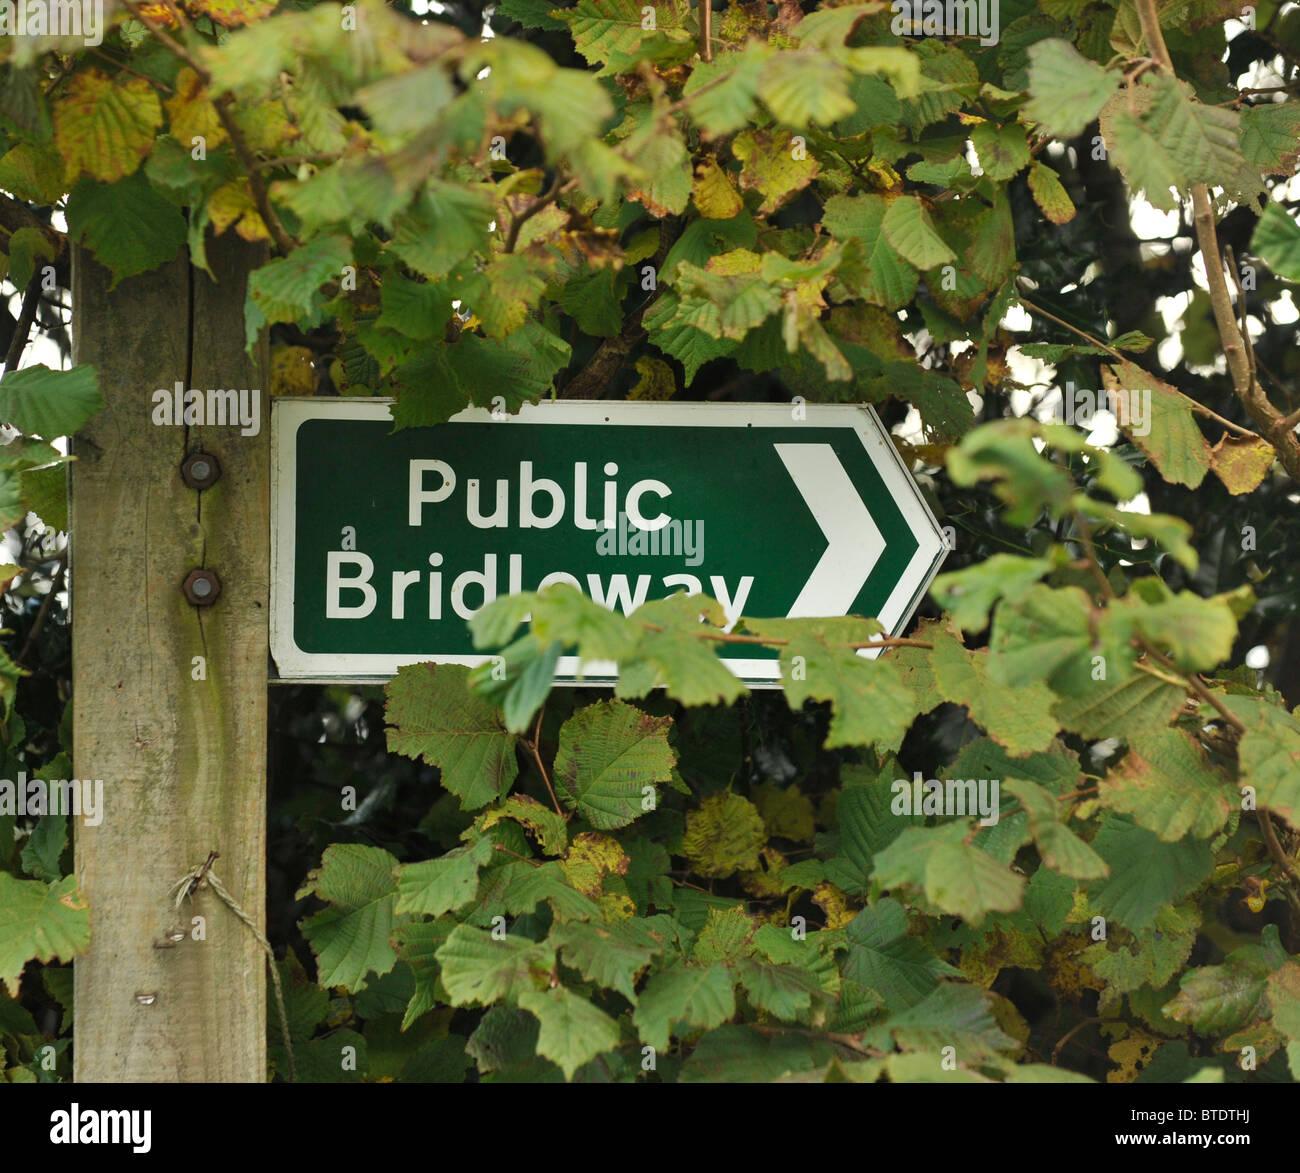 public bridleway sign hidden in foliage - Stock Image